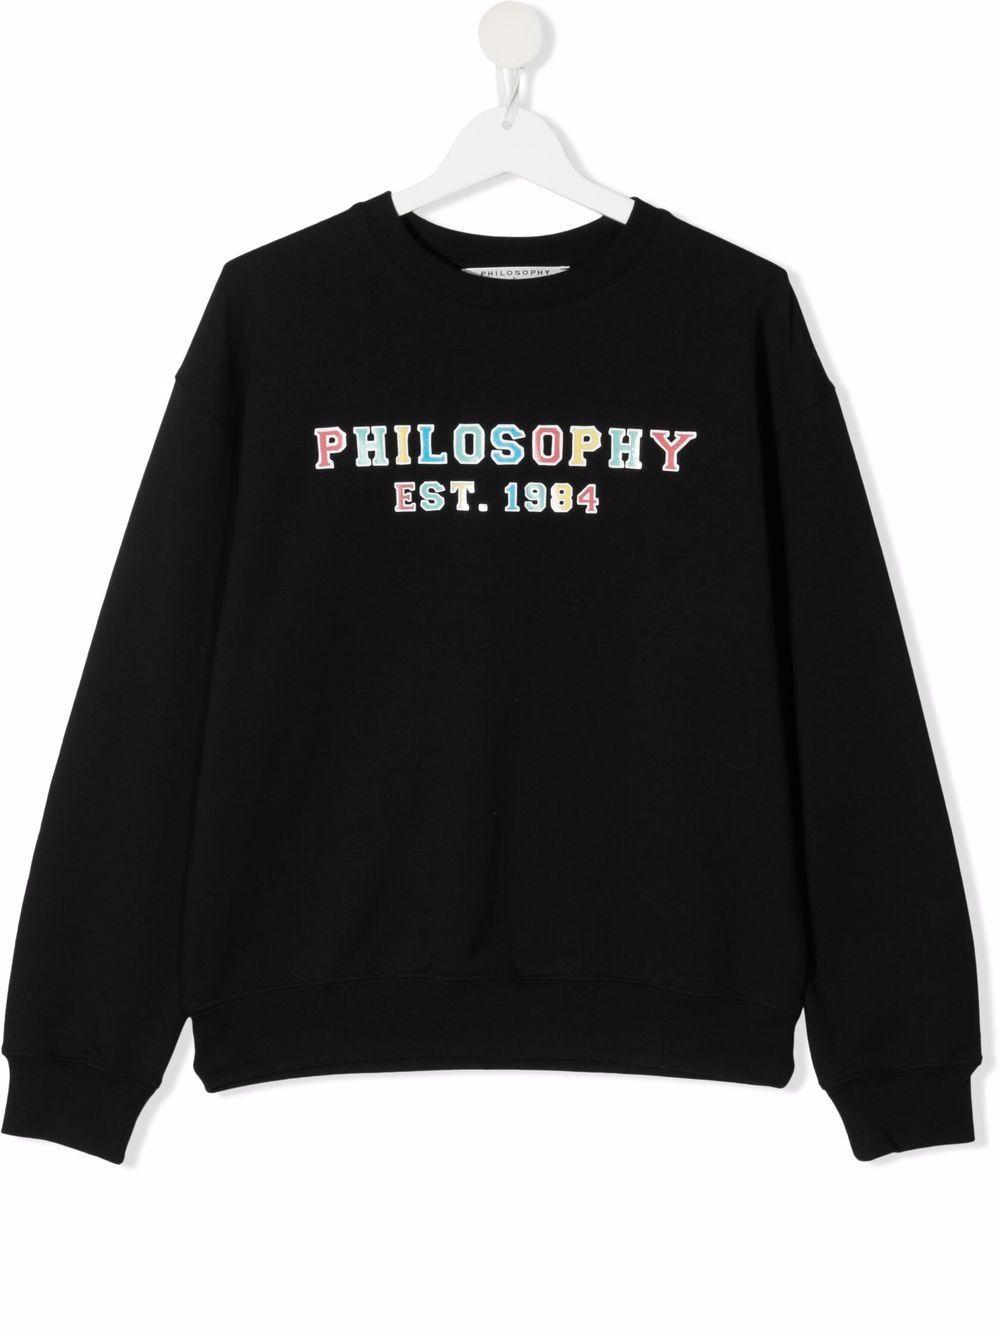 Philosofy kids | Sweatshirt | PJFE56FE147YP002N002T